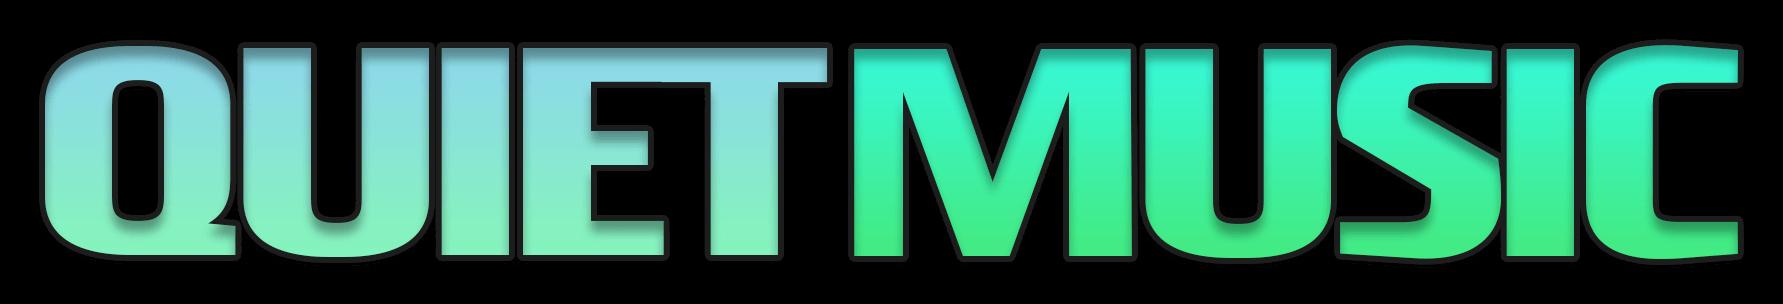 logo 2021 04